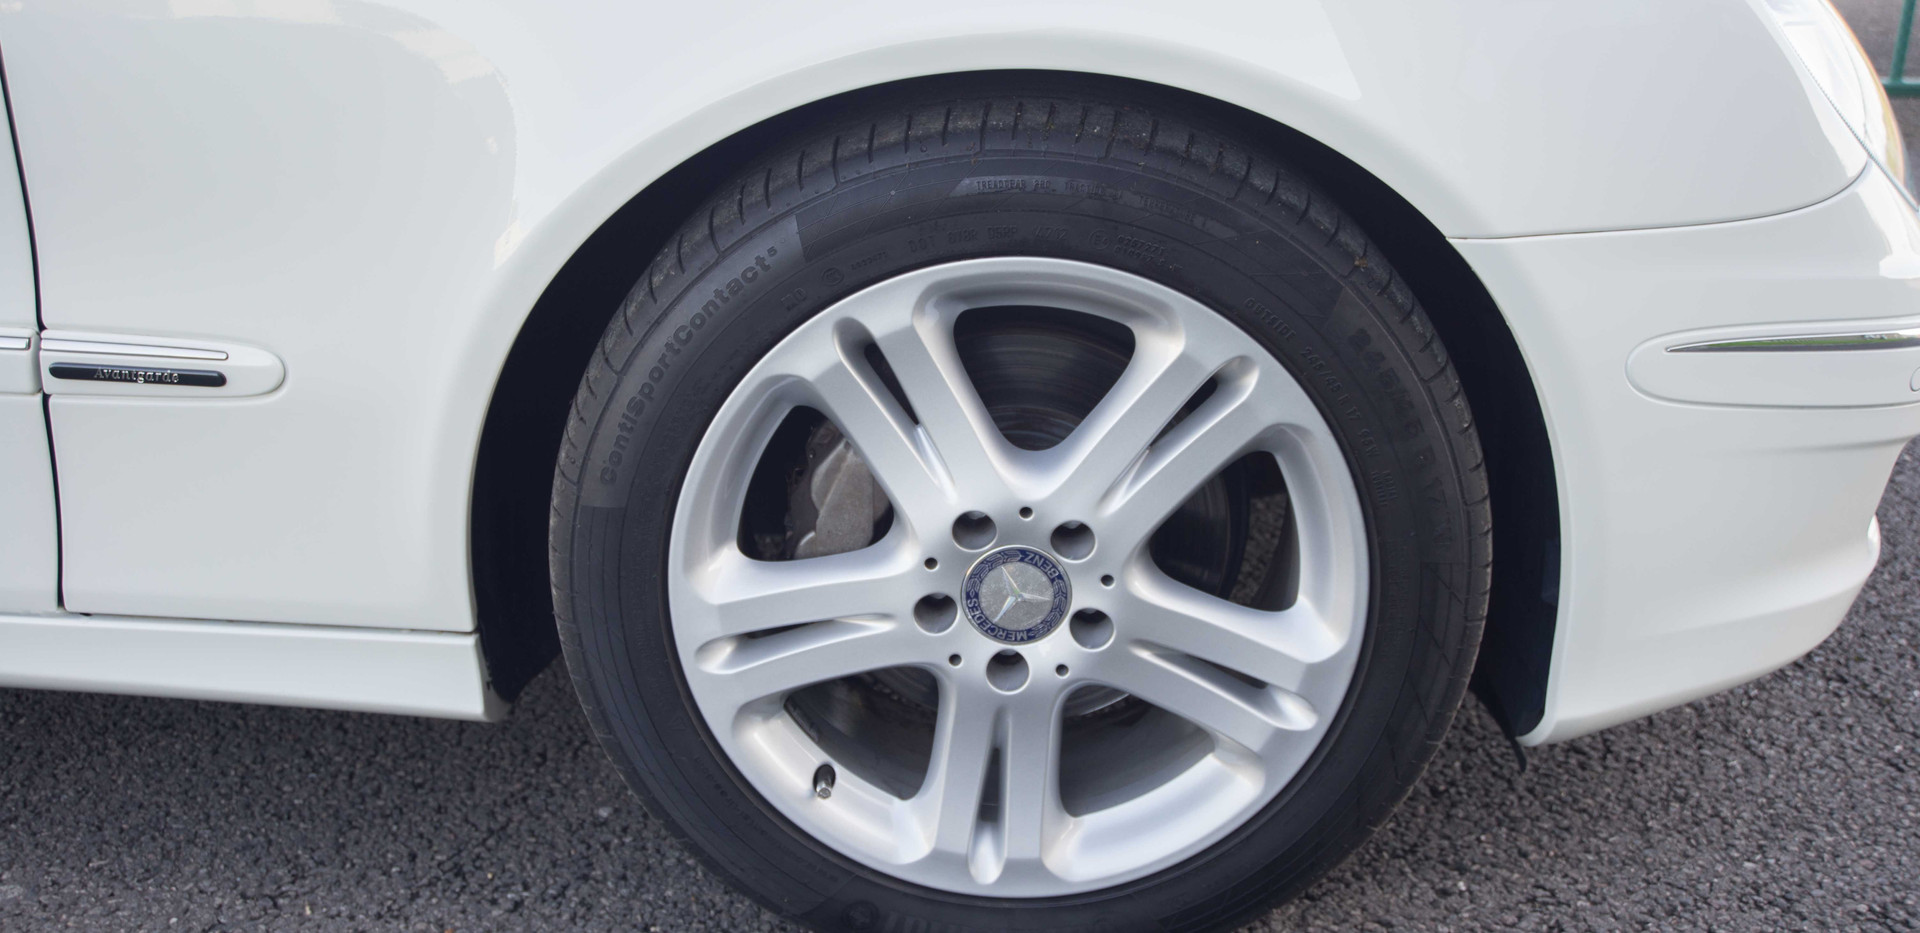 Mercedes E350 For Sale UK London  (22 of